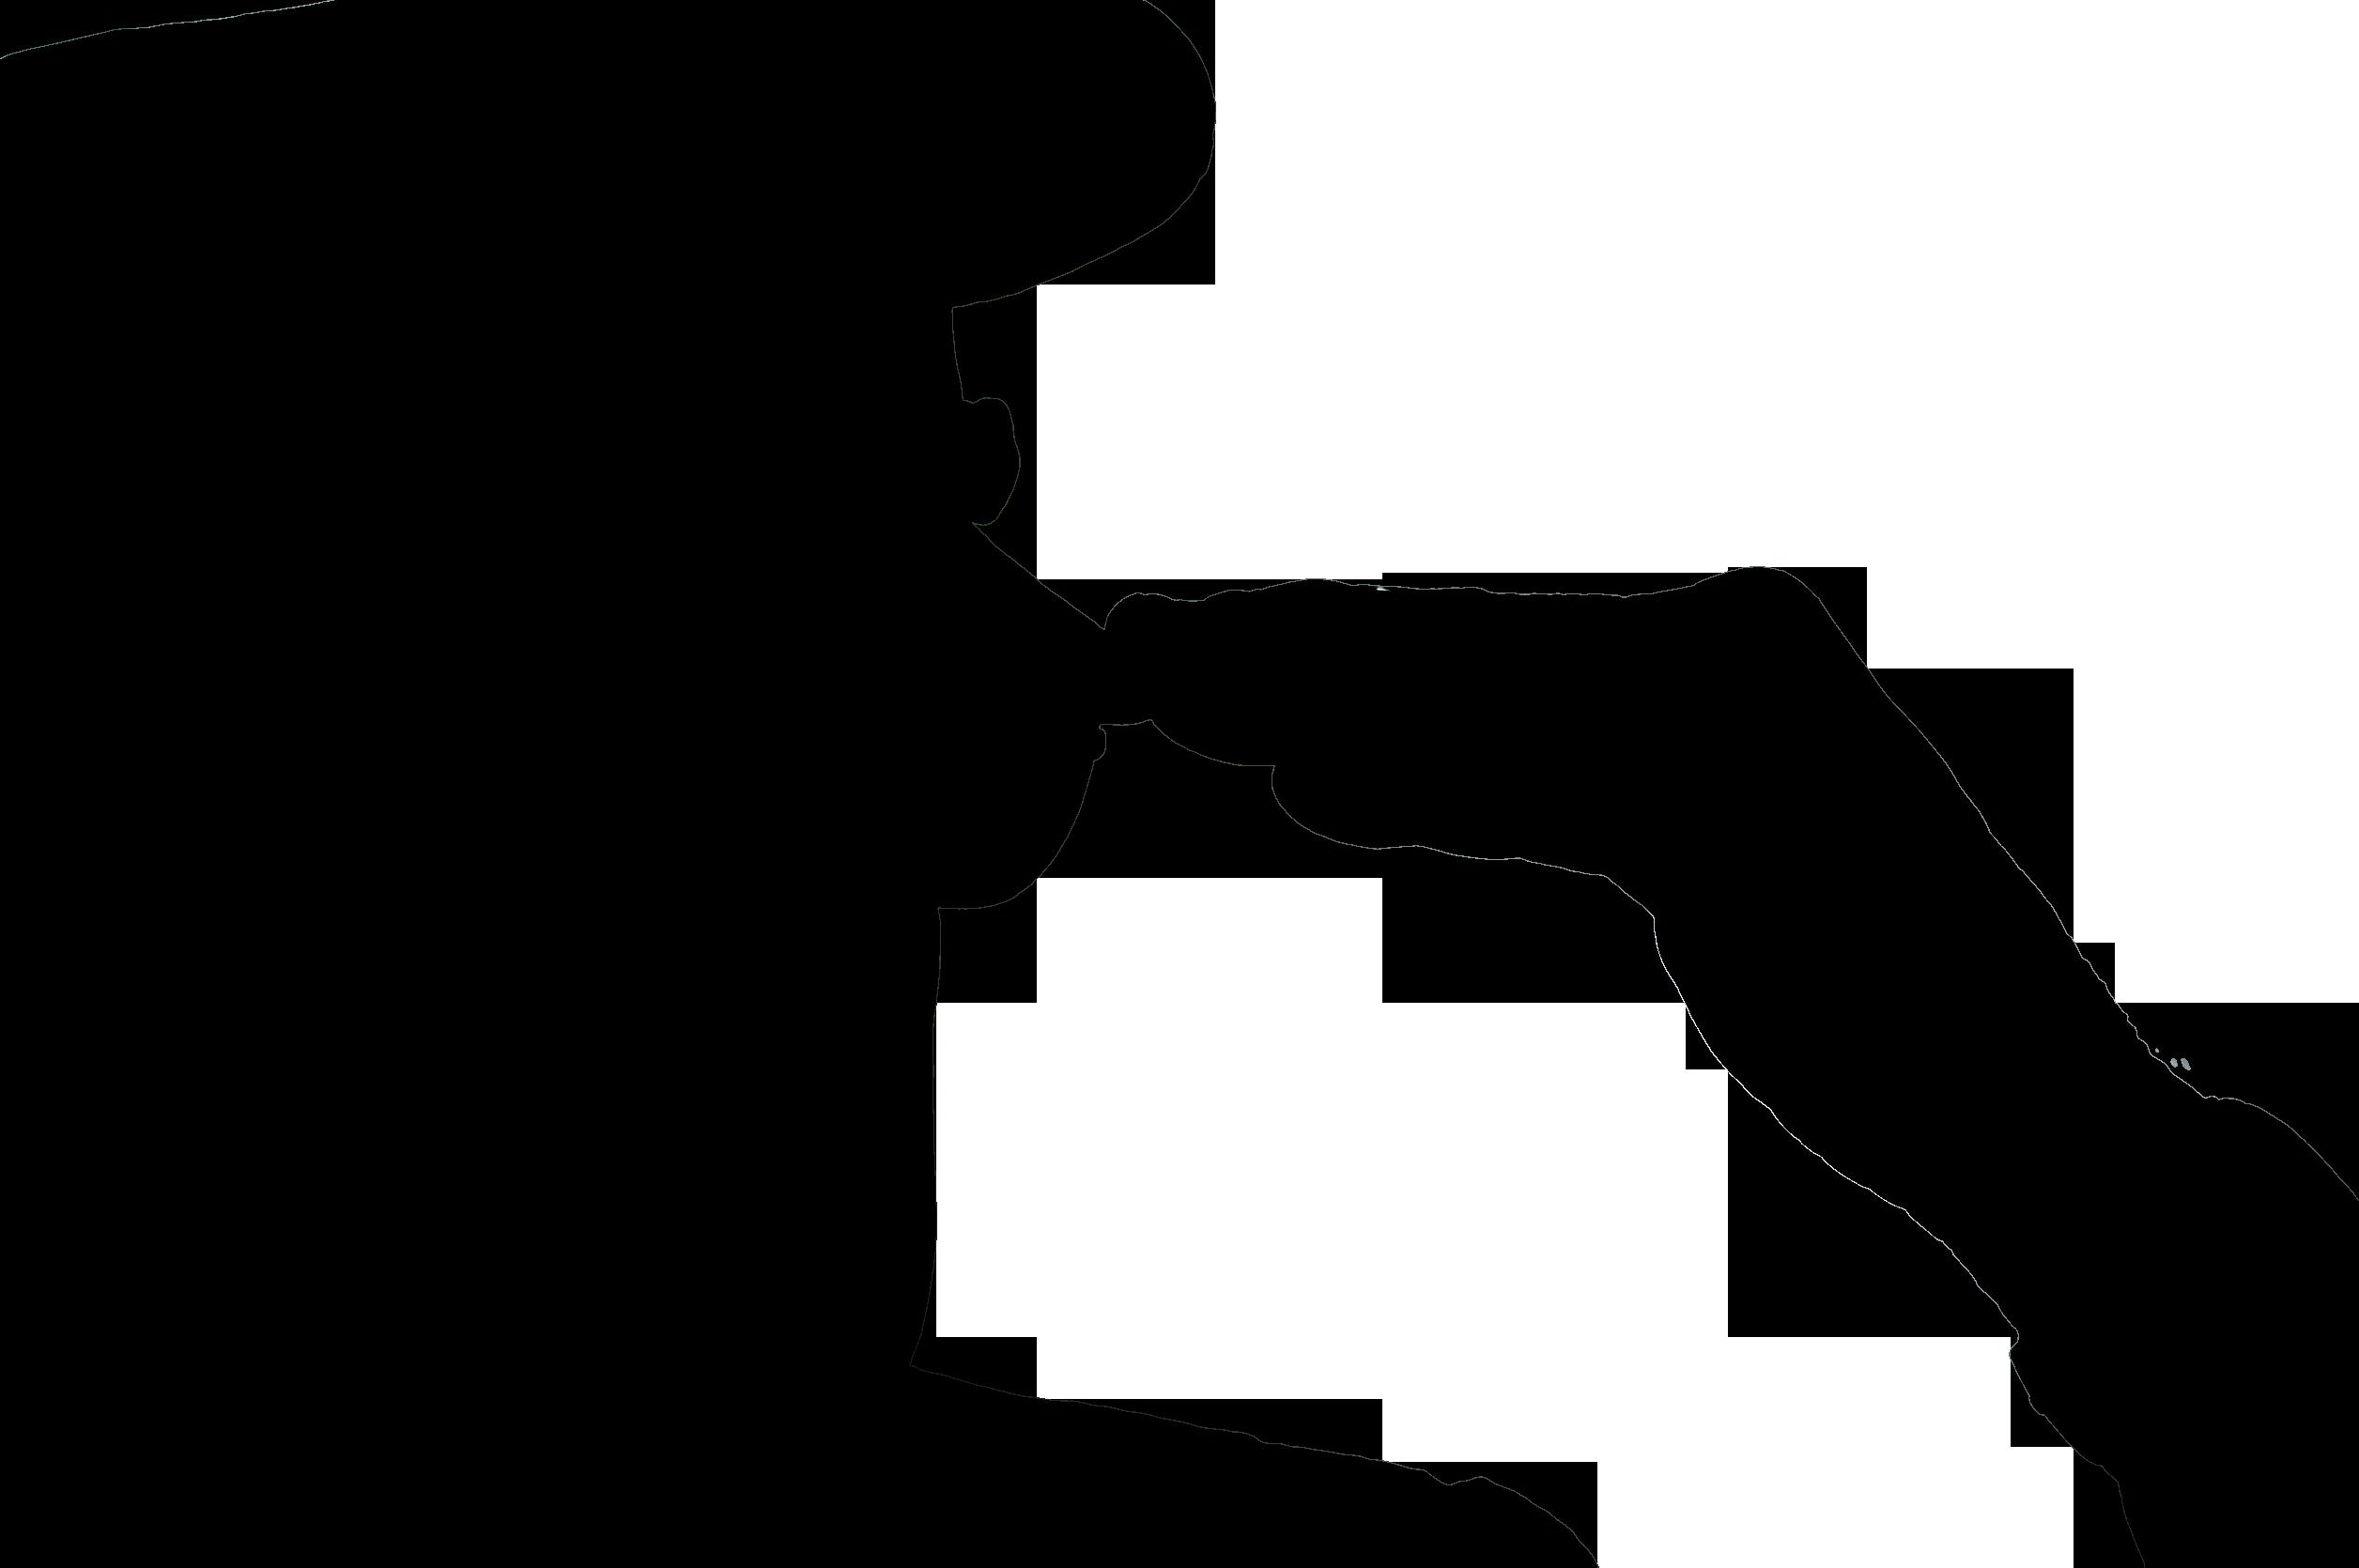 2512x1670 Marine Clipart Silhouette